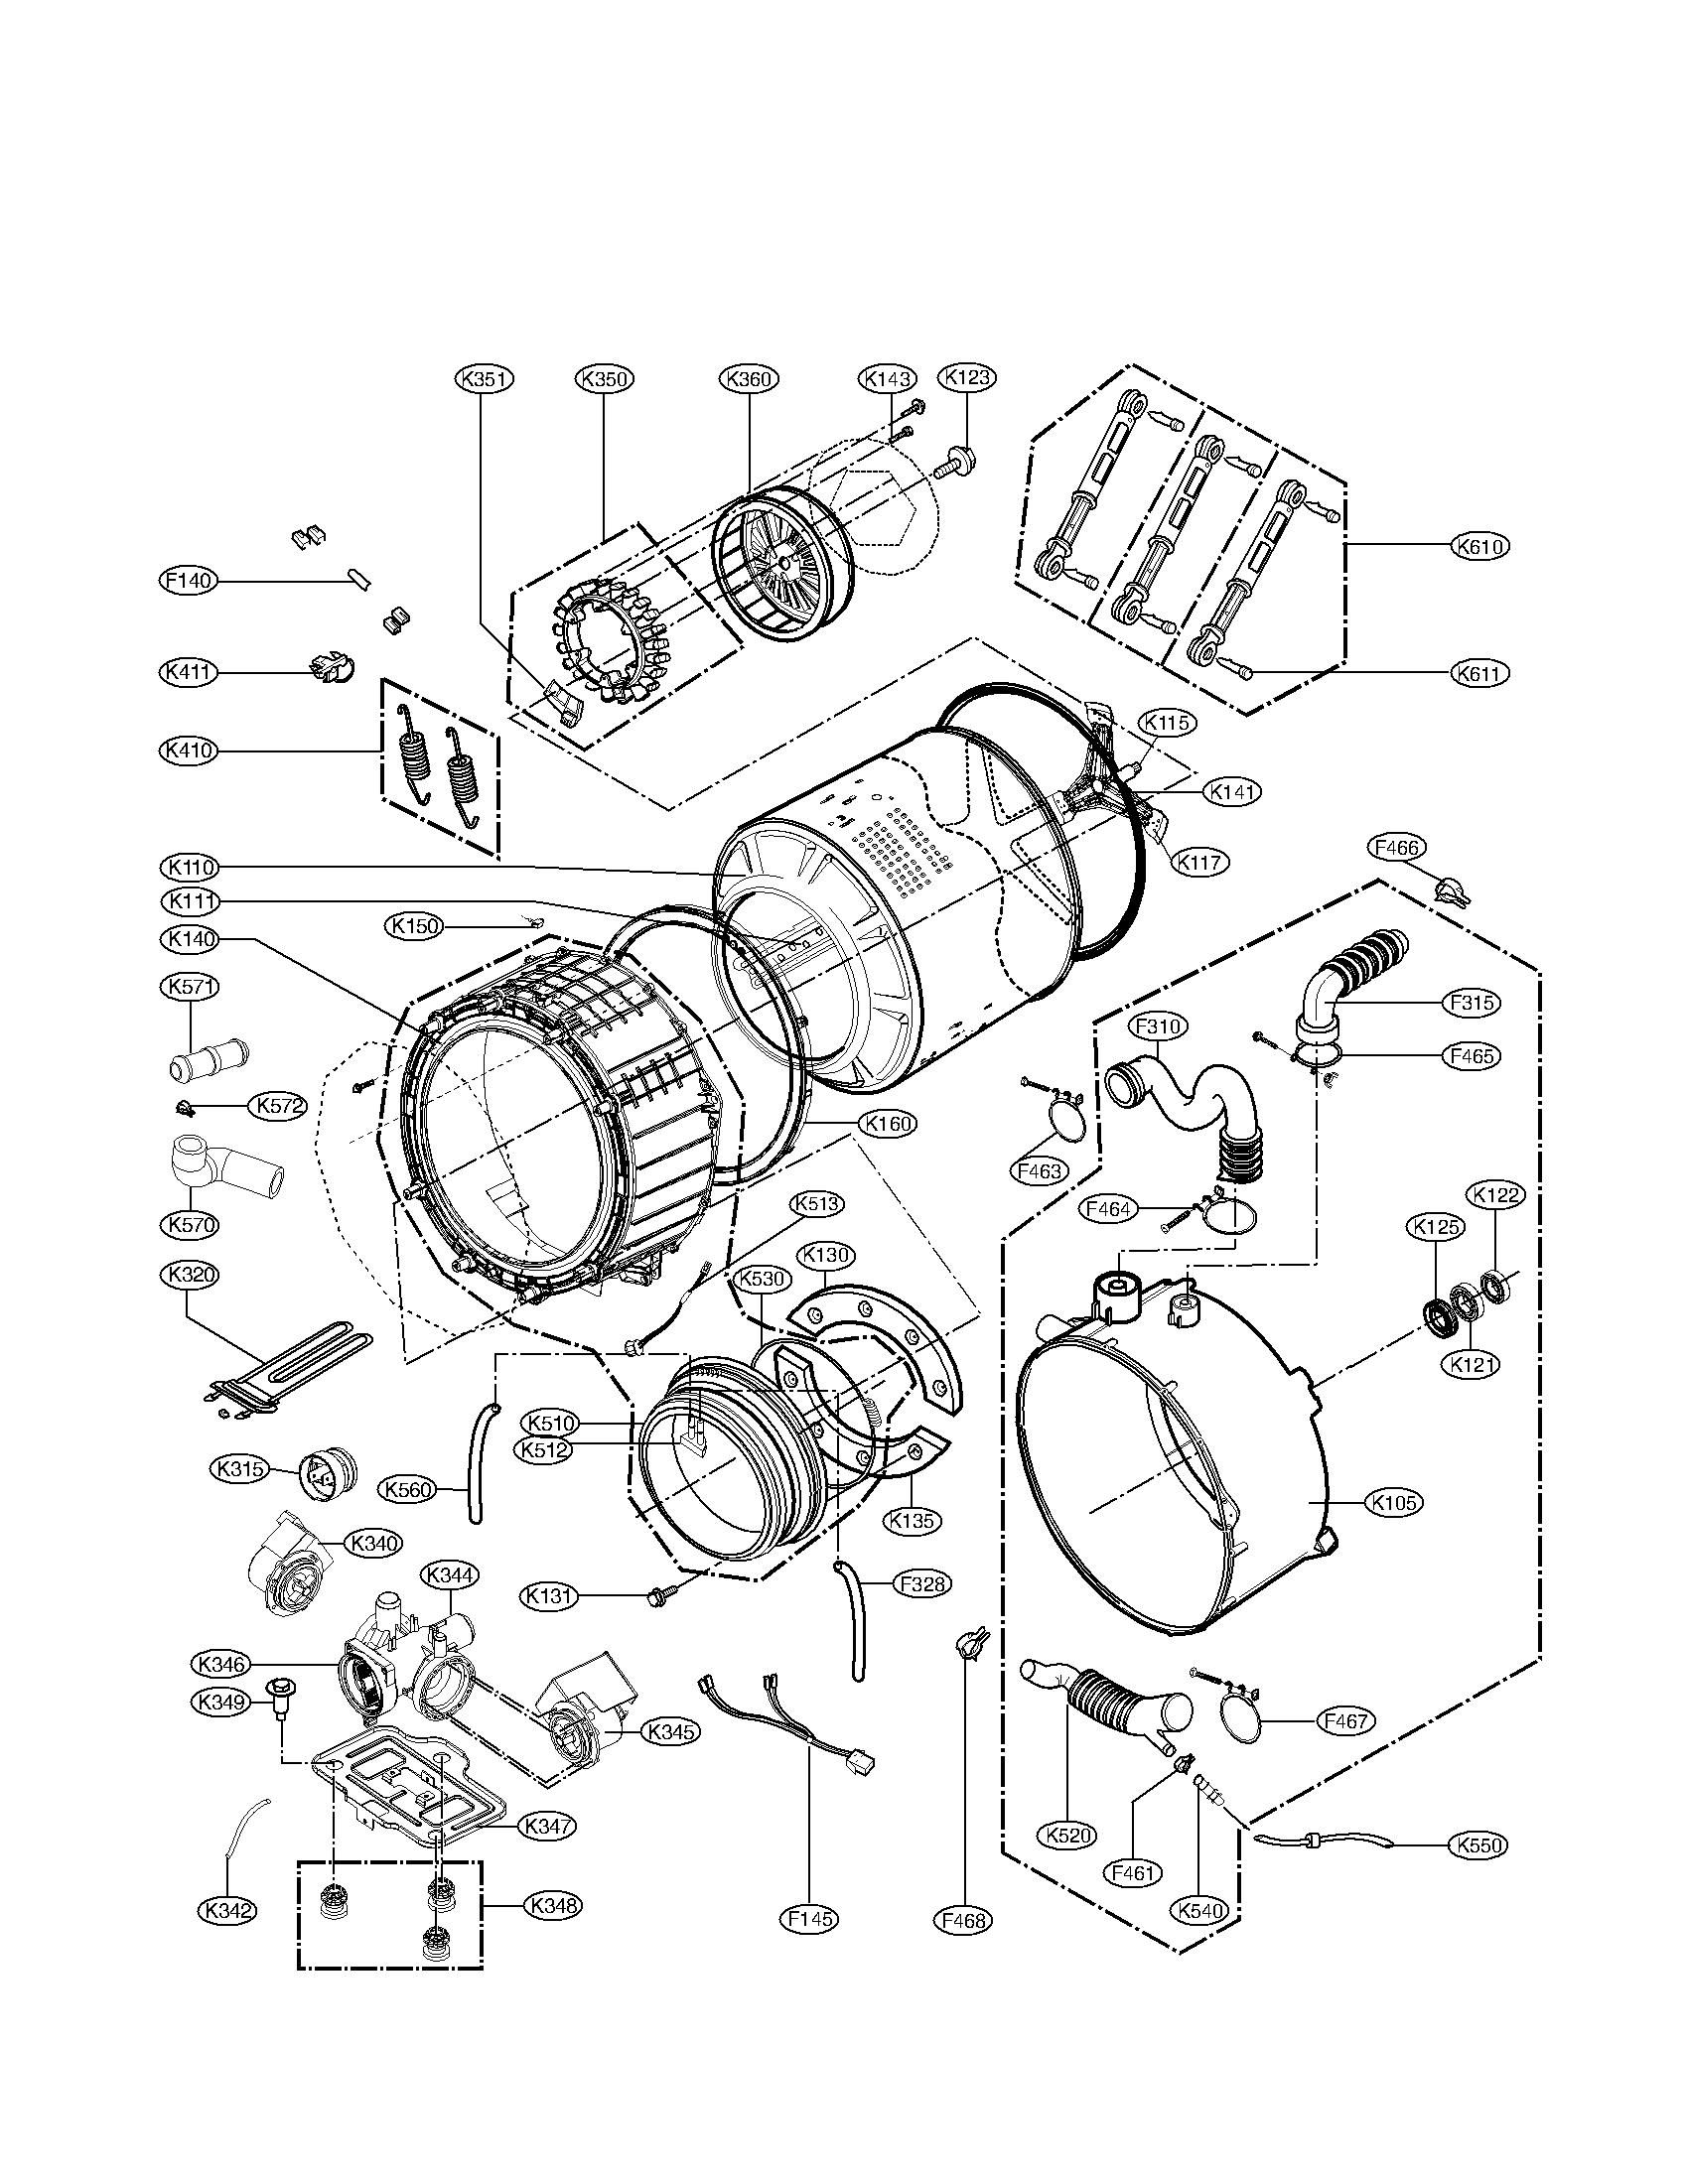 5f2a2c595ead274da069266a4b6405fd?resize=840%2C1087&ssl=1 kenmore washer diagram periodic & diagrams science  at creativeand.co